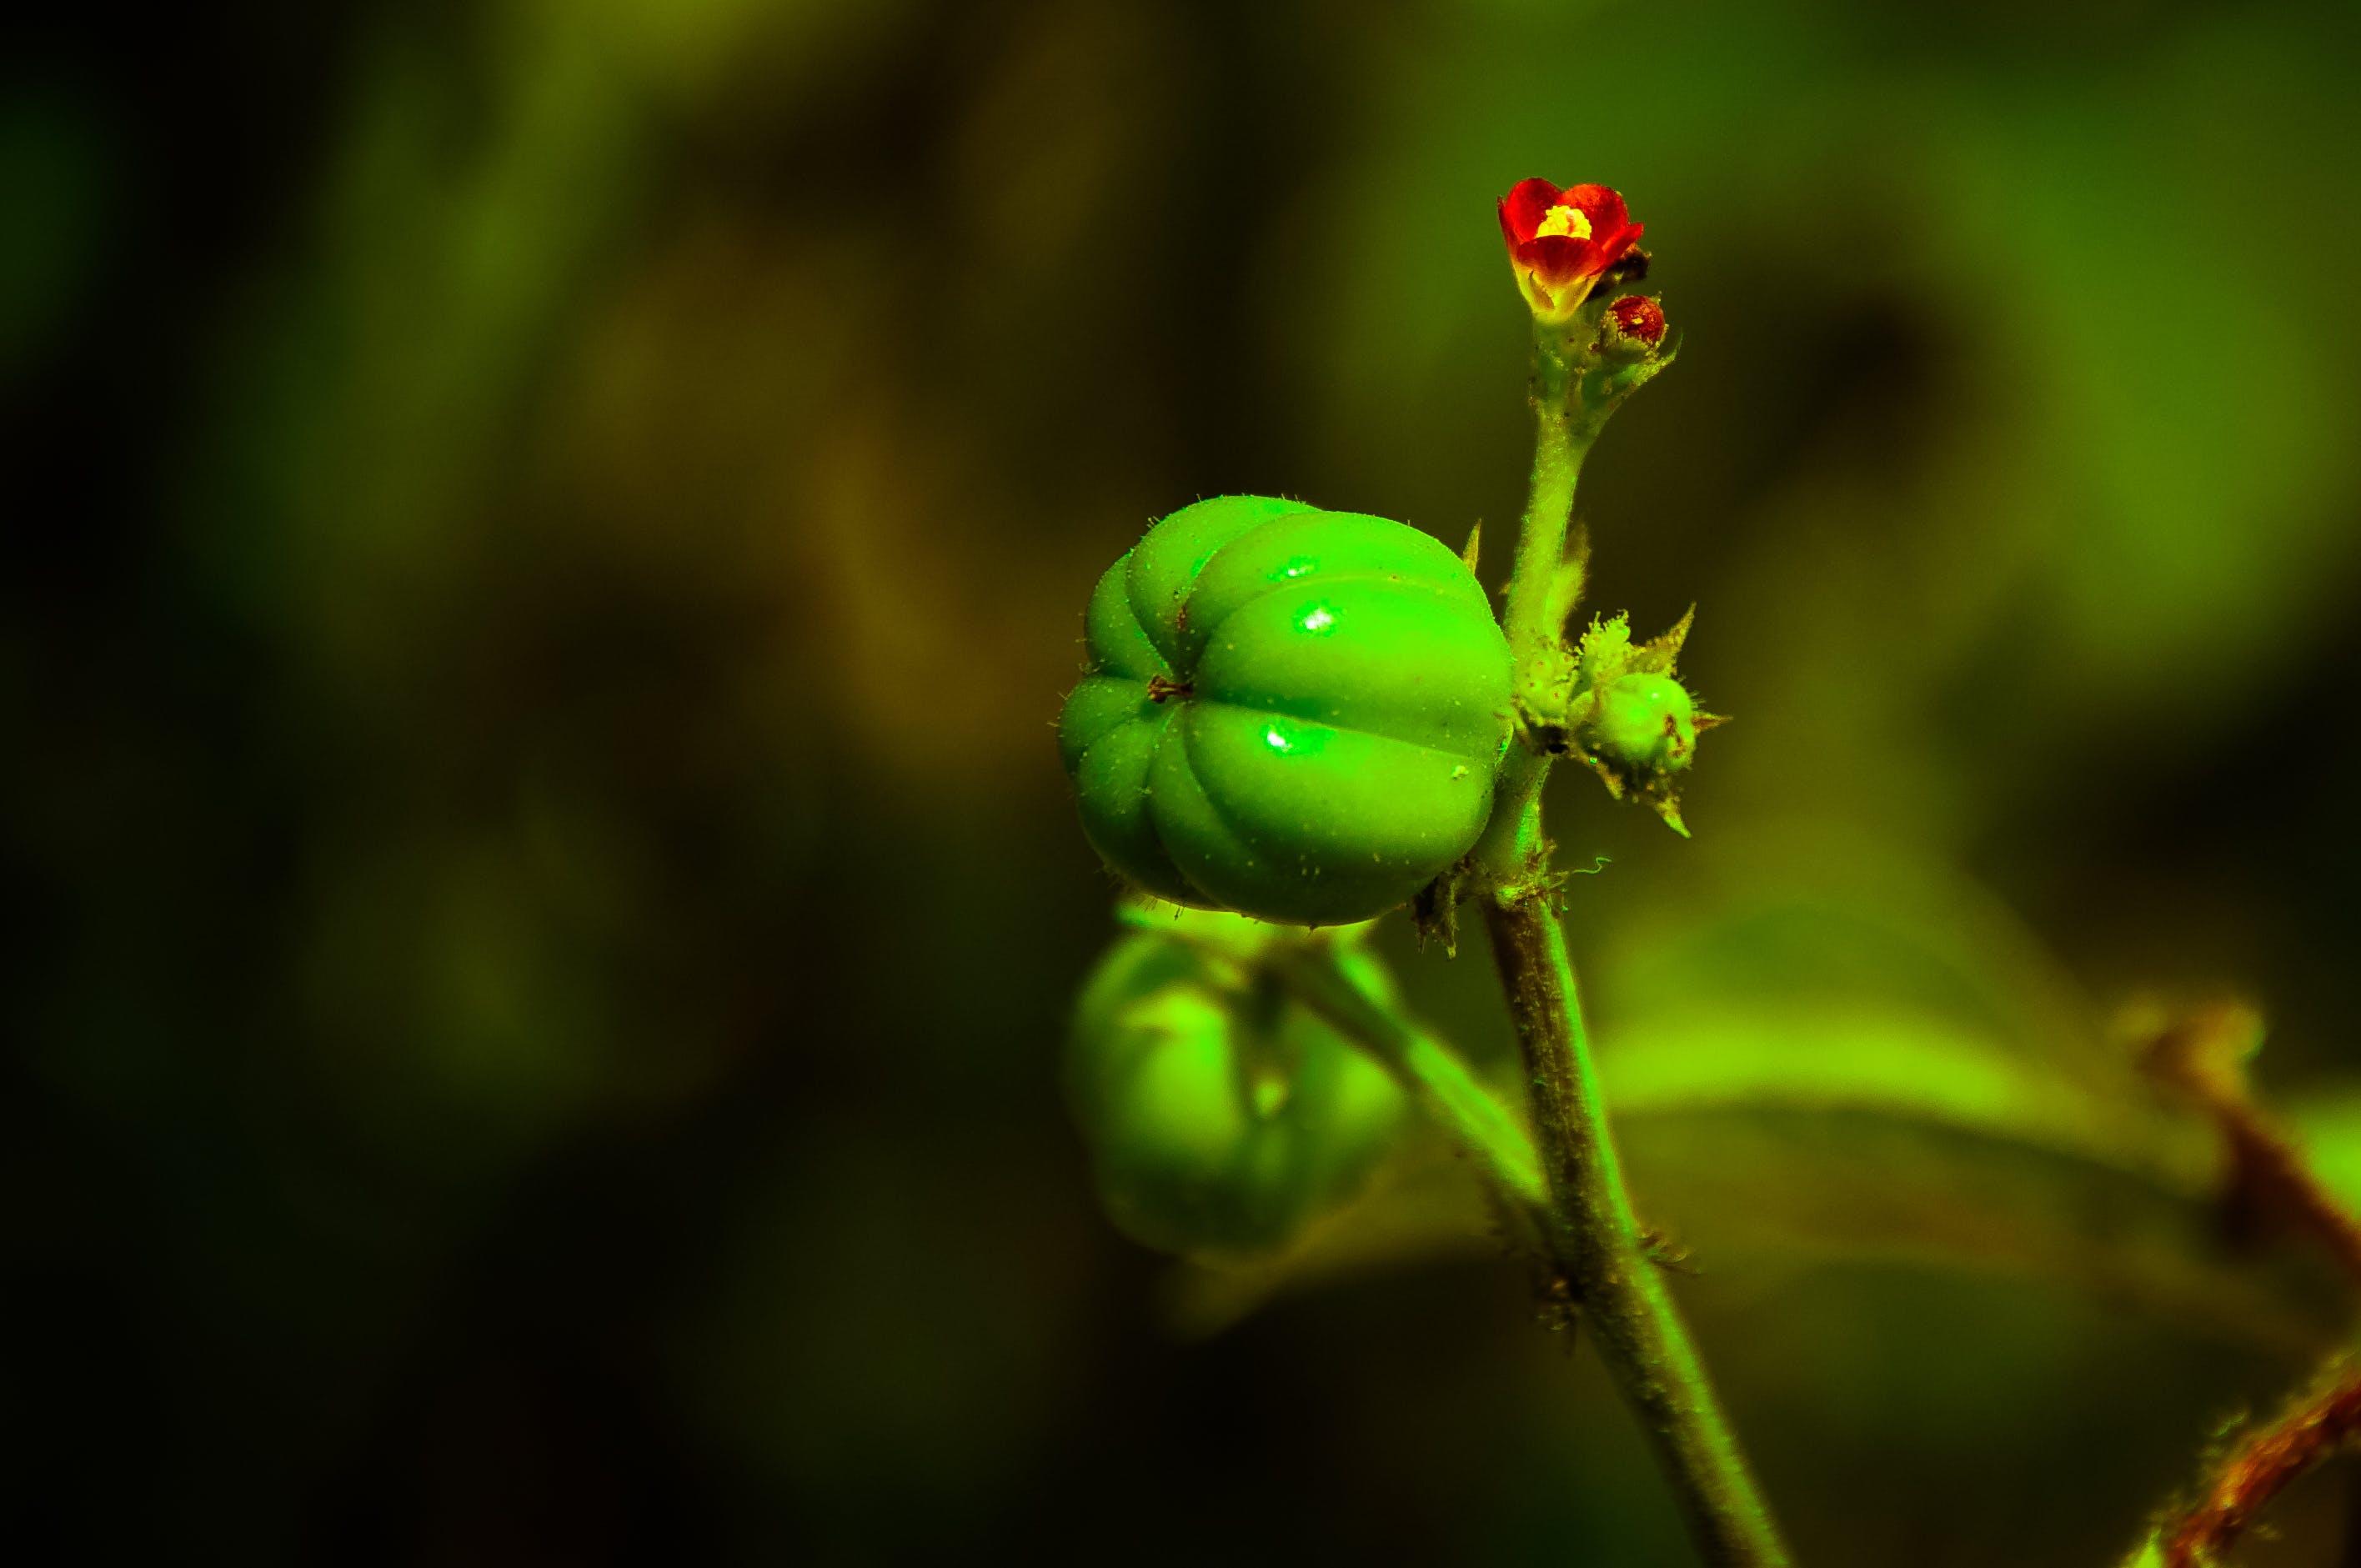 Free stock photo of beauty in nature, garden, green, macro